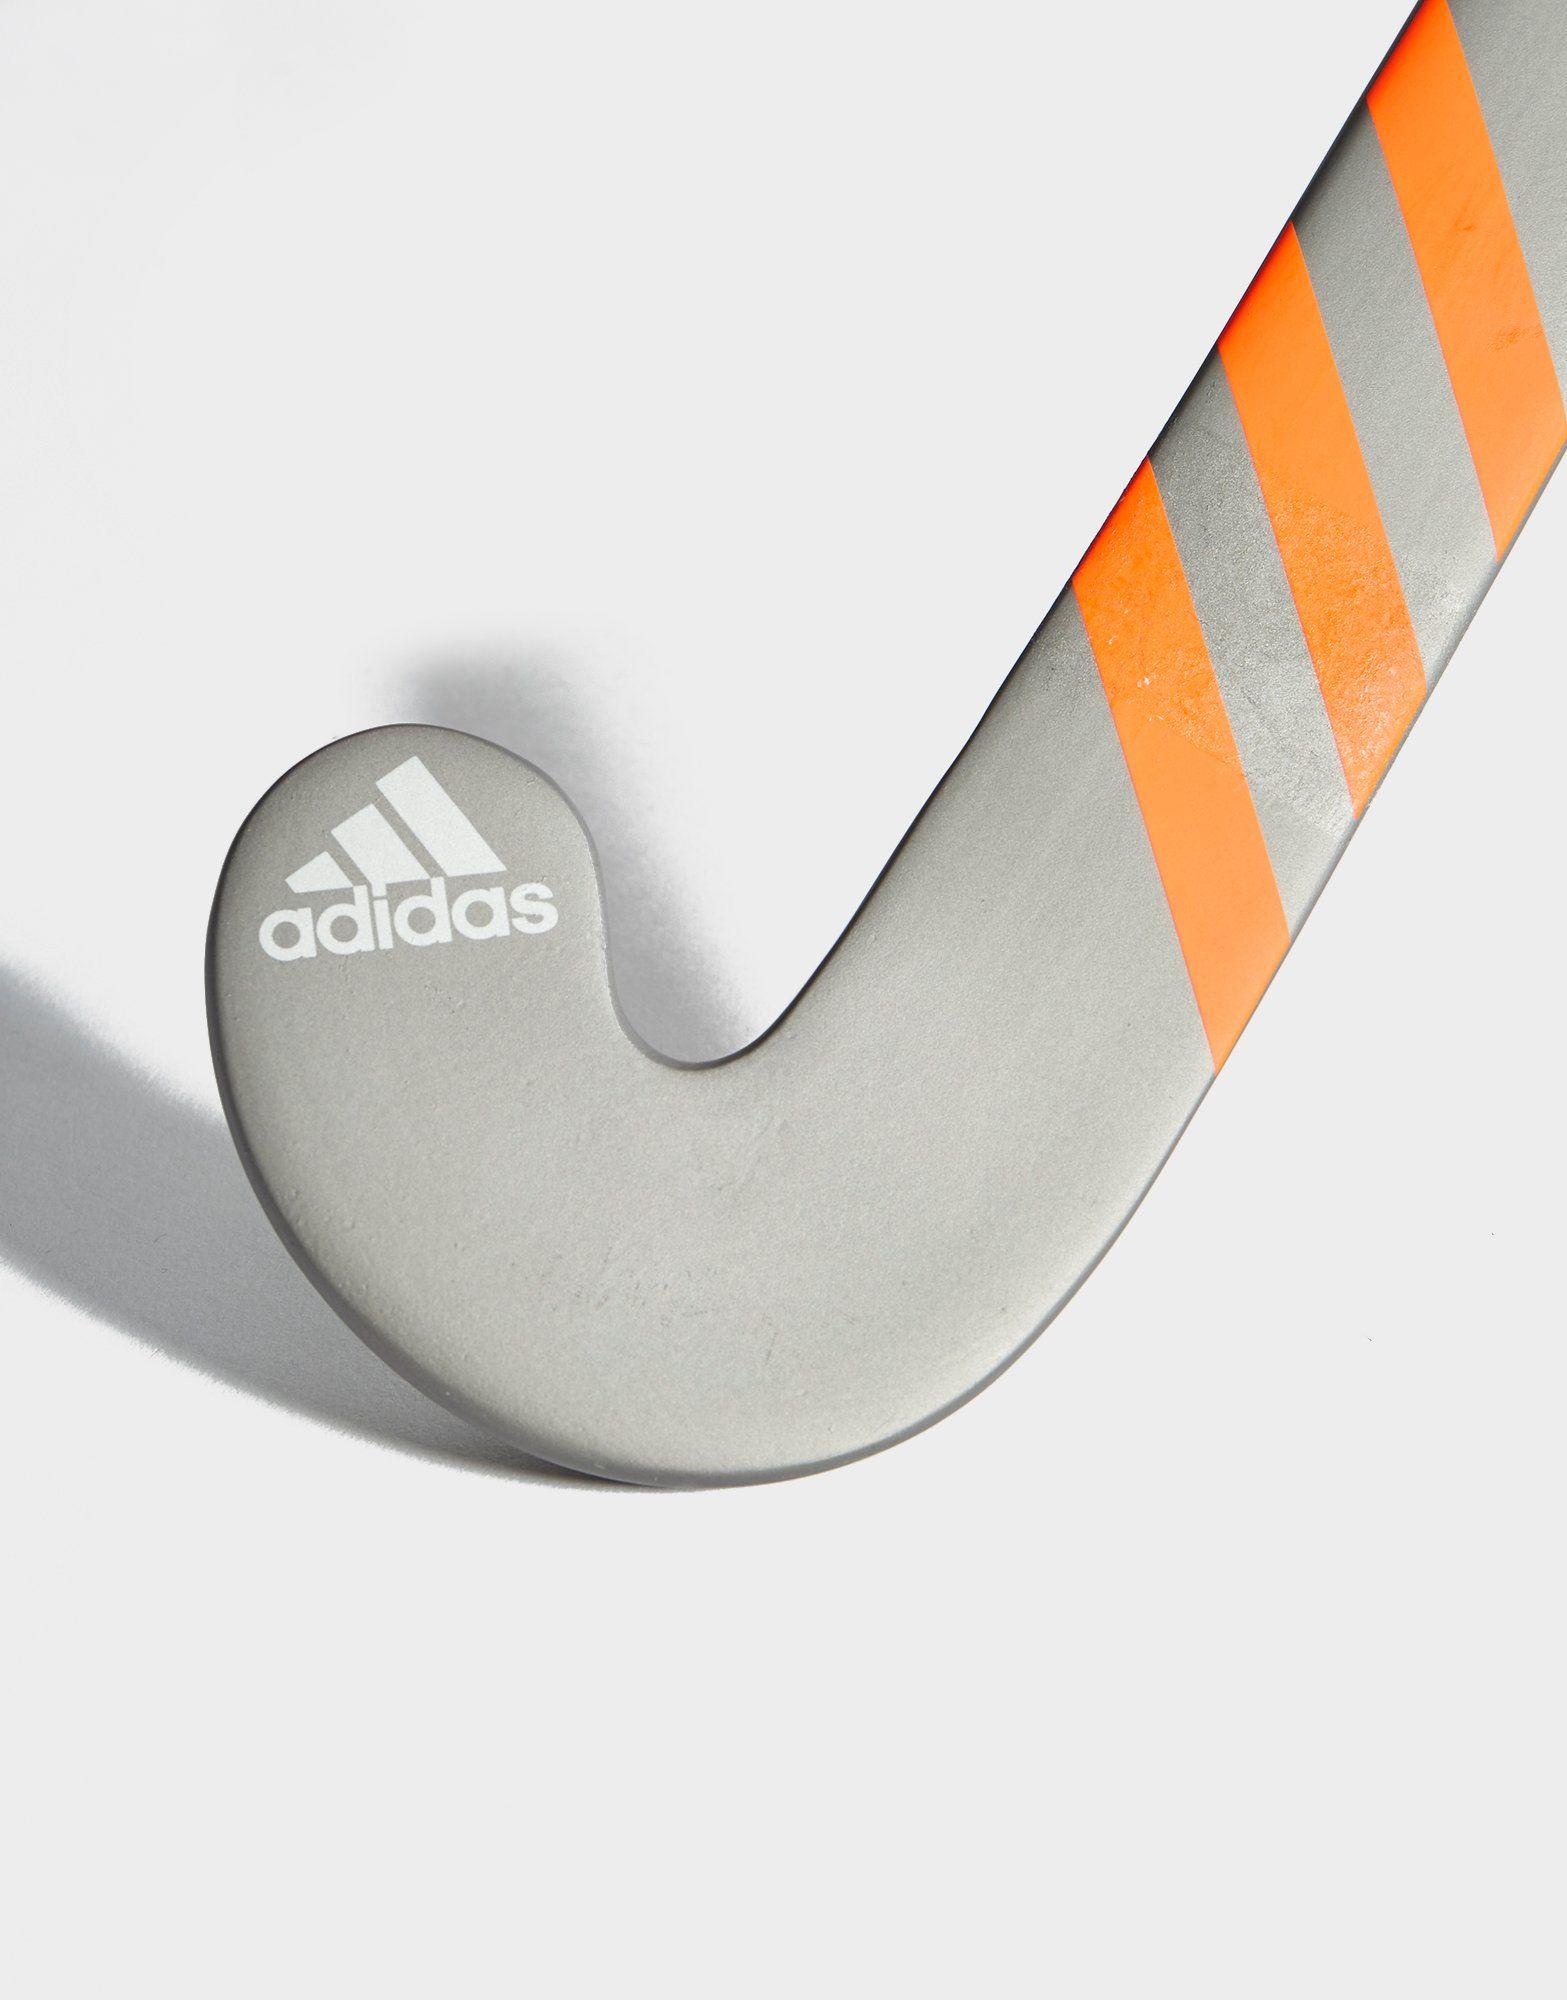 adidas TX24 Core 7 Hockey Stick